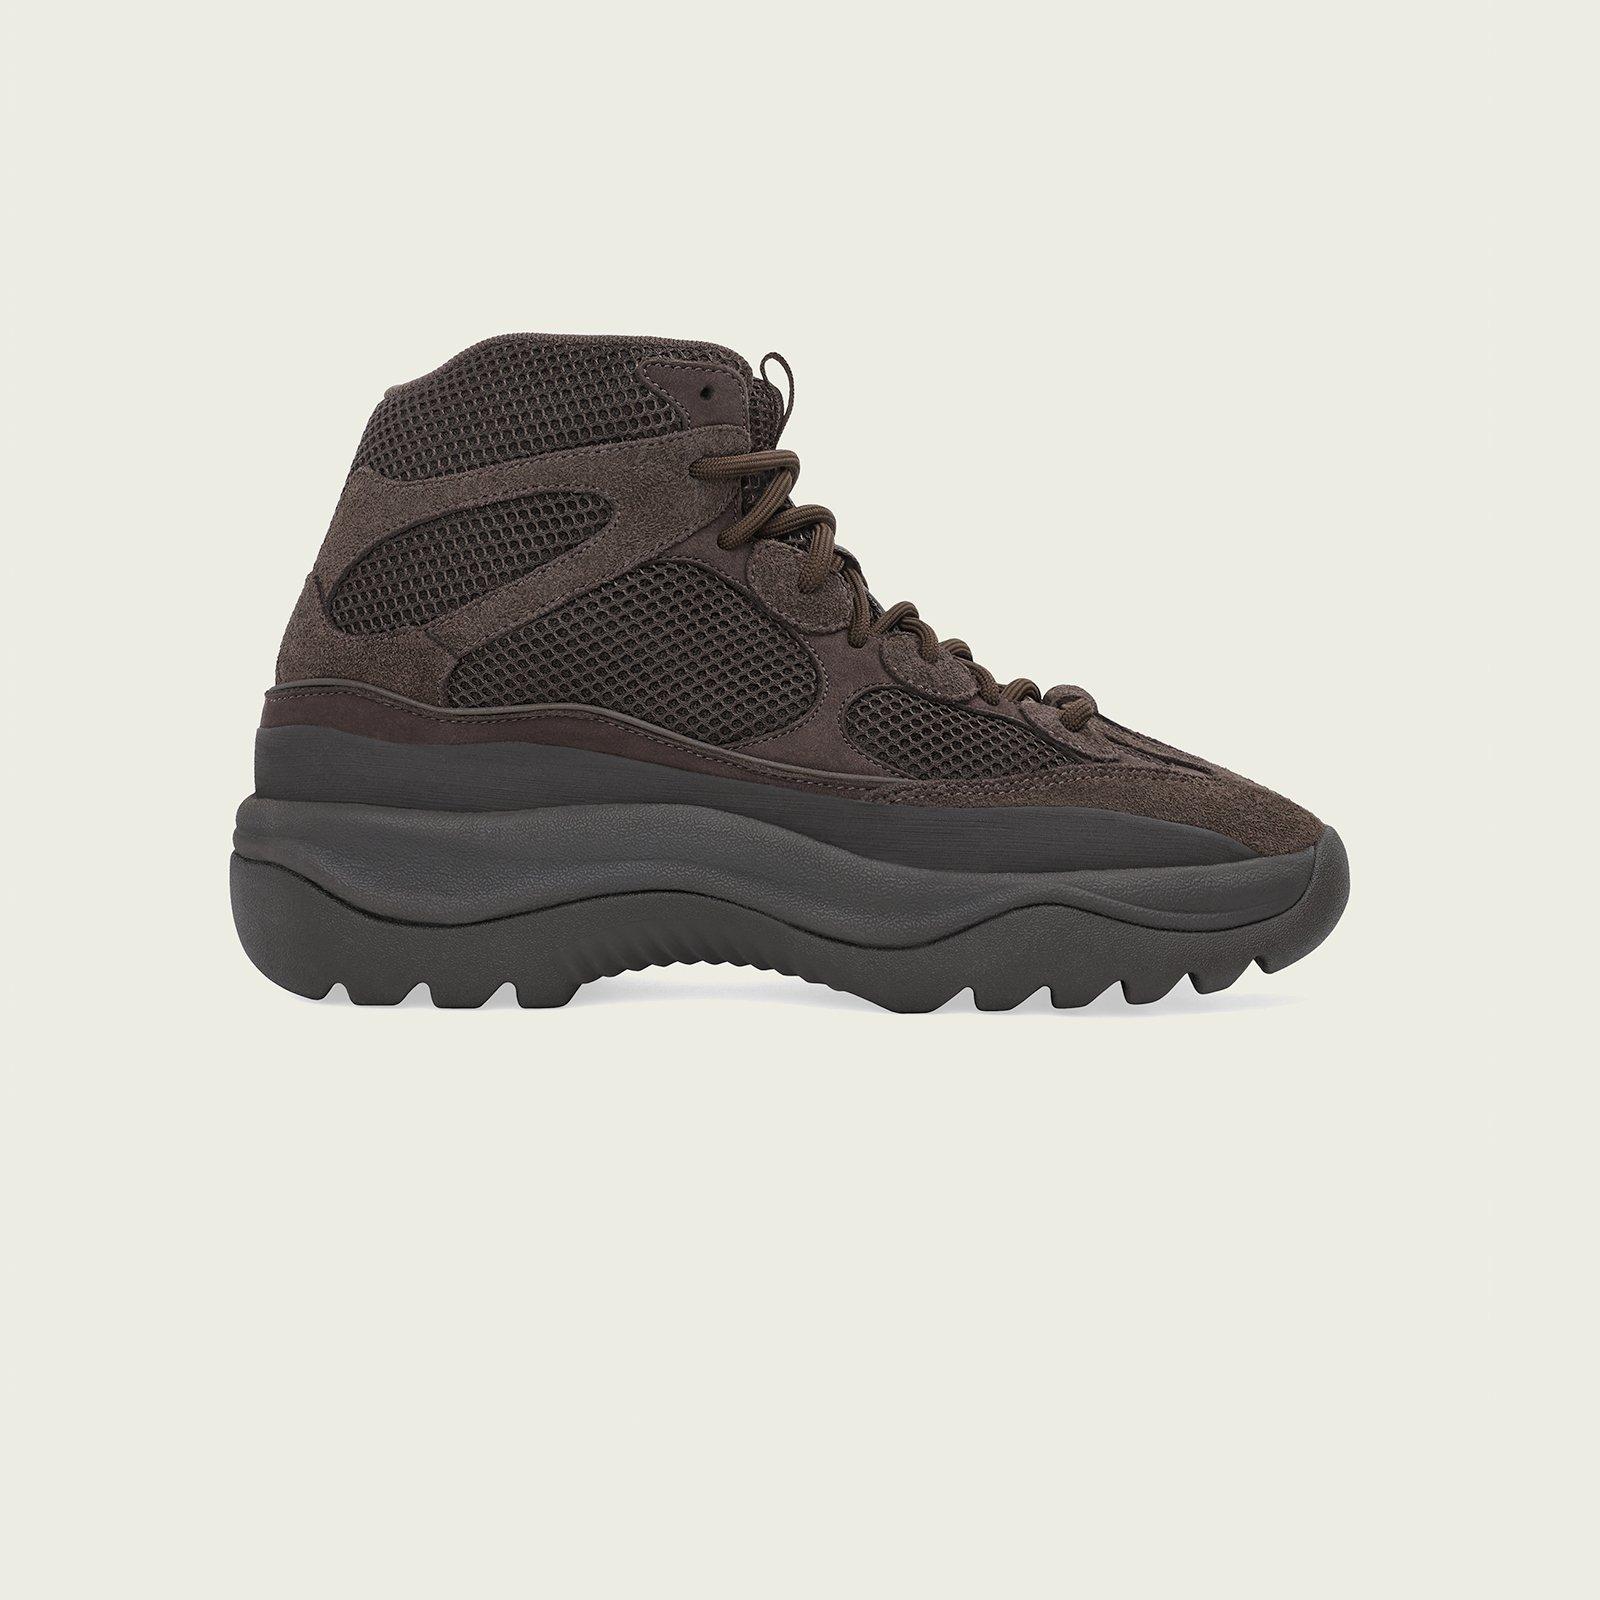 adidas Yeezy Desert Boot Eg6463 Sneakersnstuff I